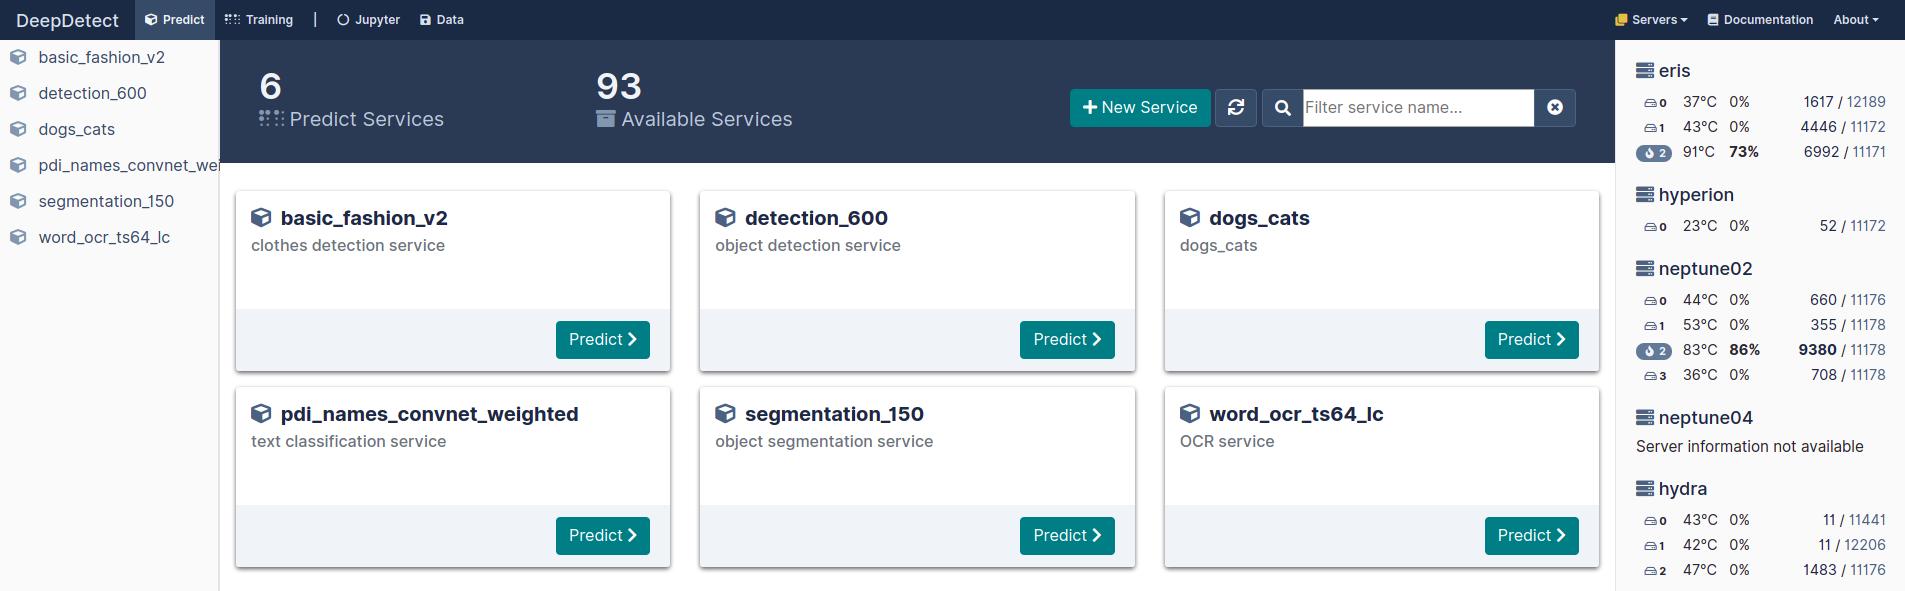 DeepDetect Platform